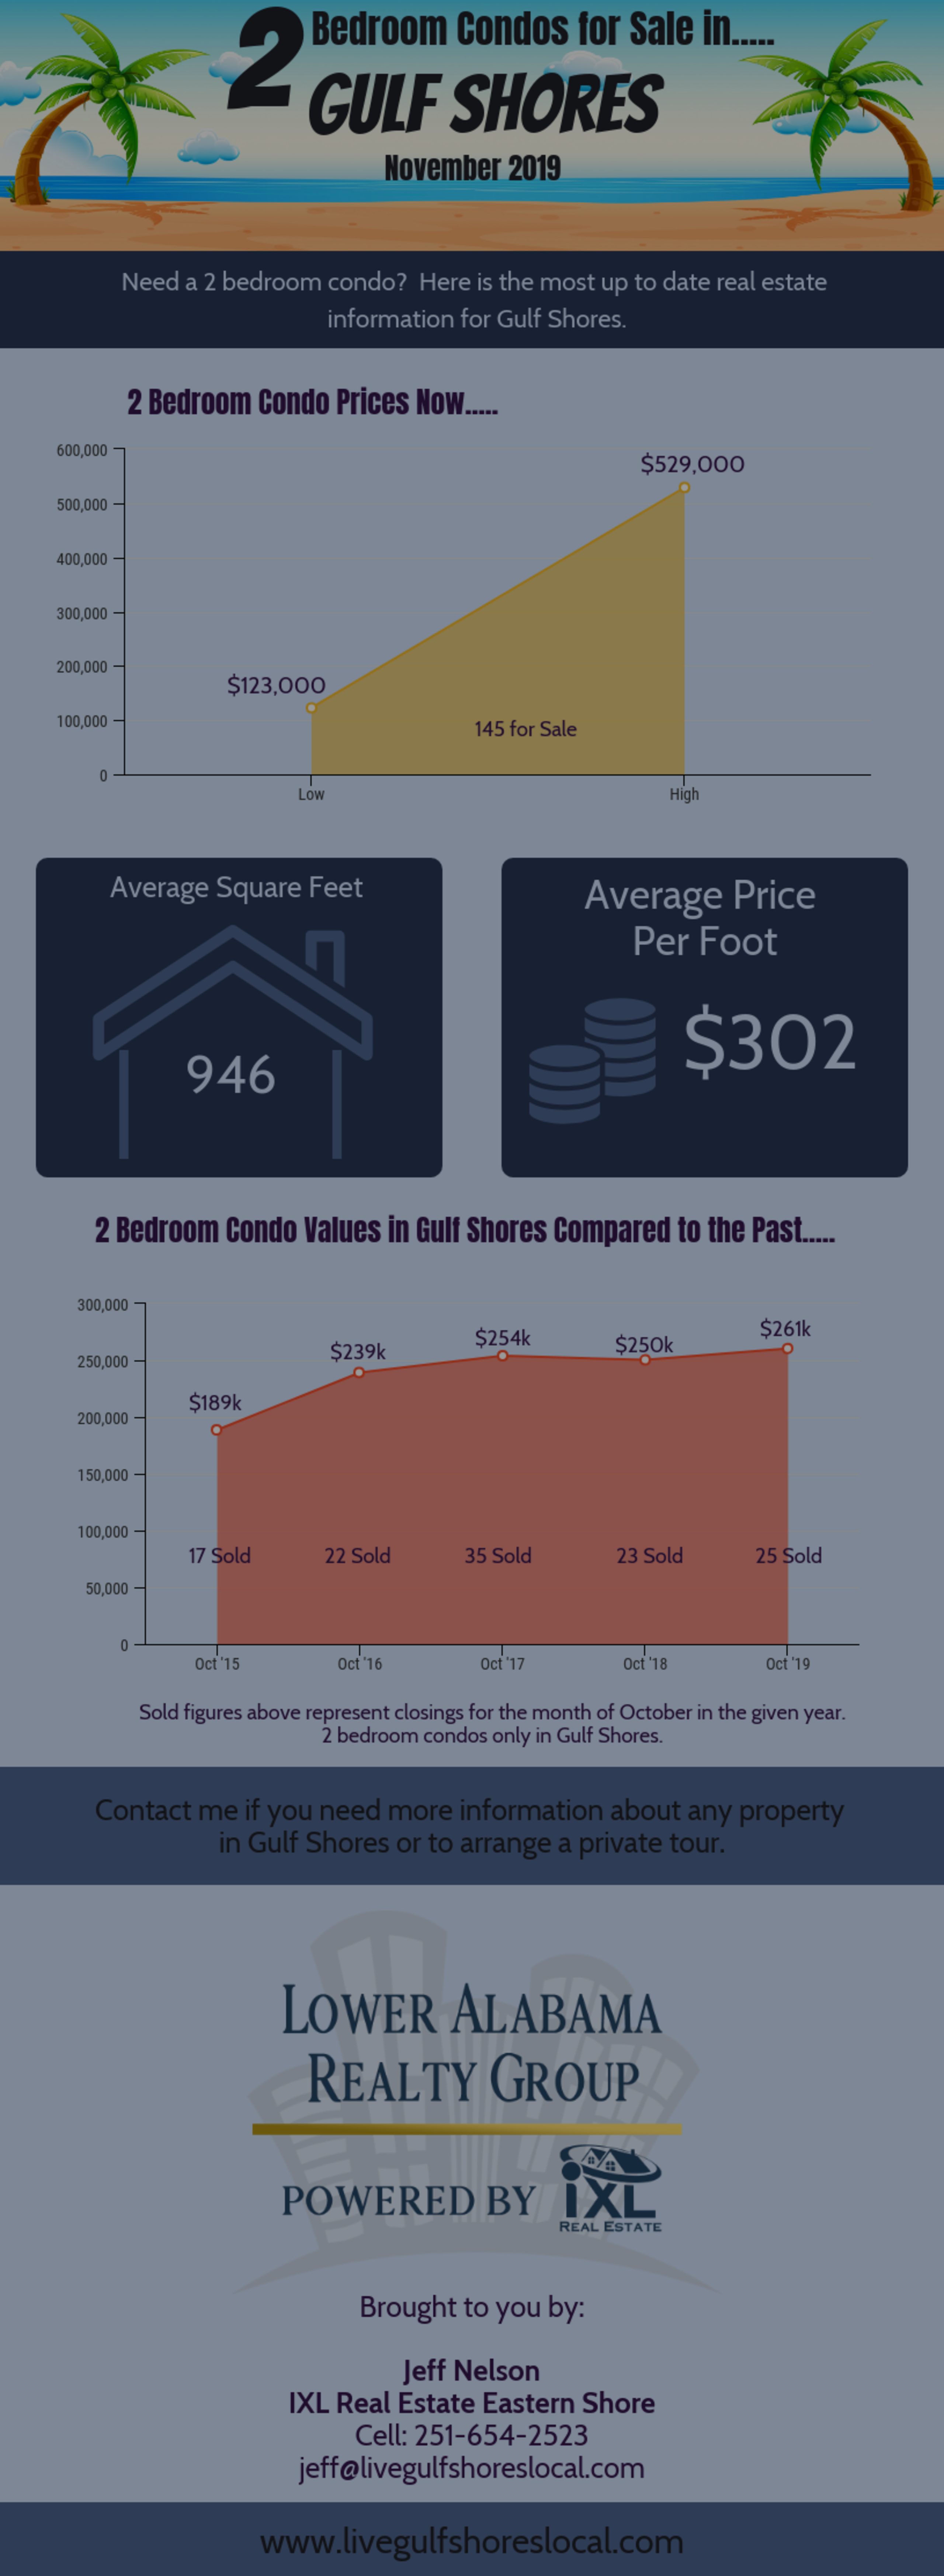 2 Bedroom Gulf Shores Condo Overview – December 2019